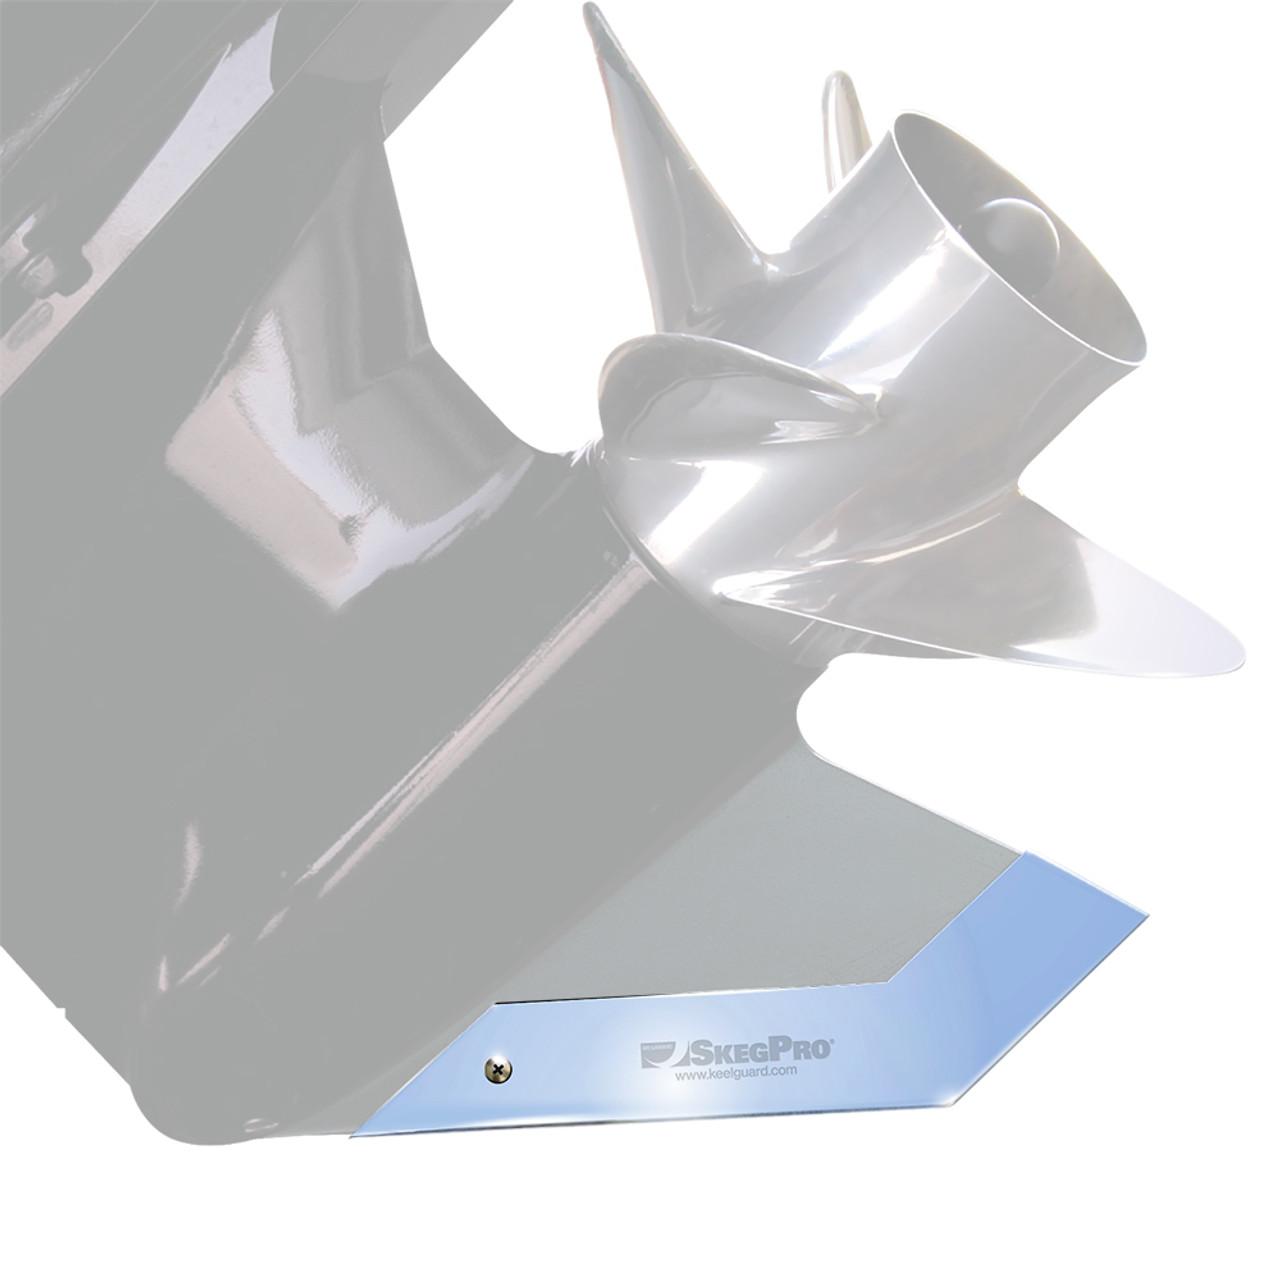 2.835 OD M6 x 18 Screw Size 8 Locking Screws Fenner Drives B802107 B-Loc Shrink Disc 2.84 Width 1.4375 ID 2.835 OD 2.84 Width 02376572 1.4375 ID